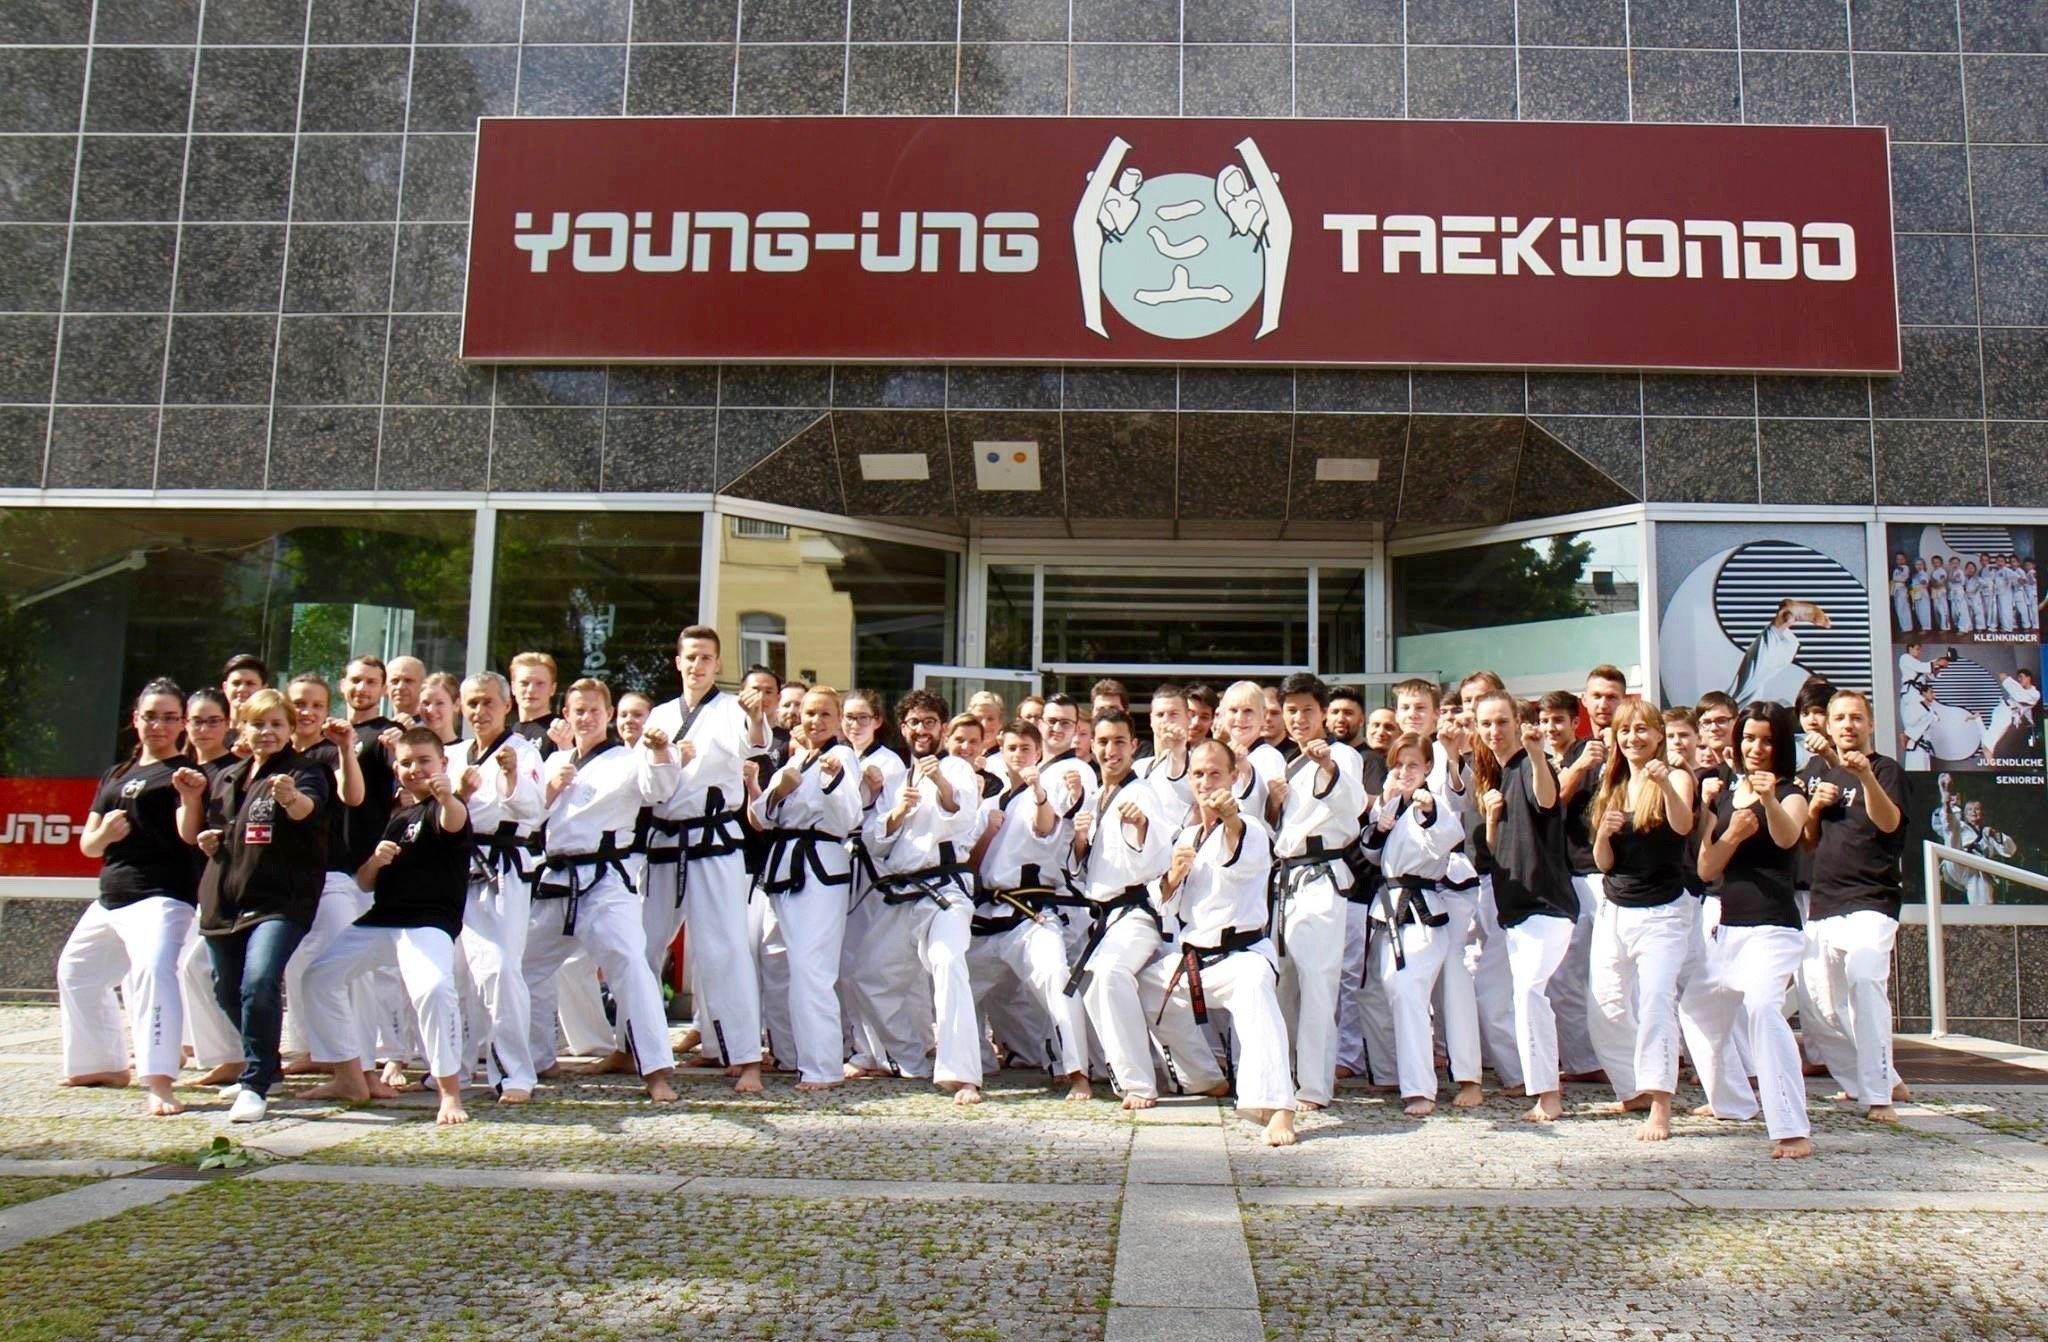 YOUNG-UNG Taekwondo Trainer Gruppe vor der Taekwondo Schuler